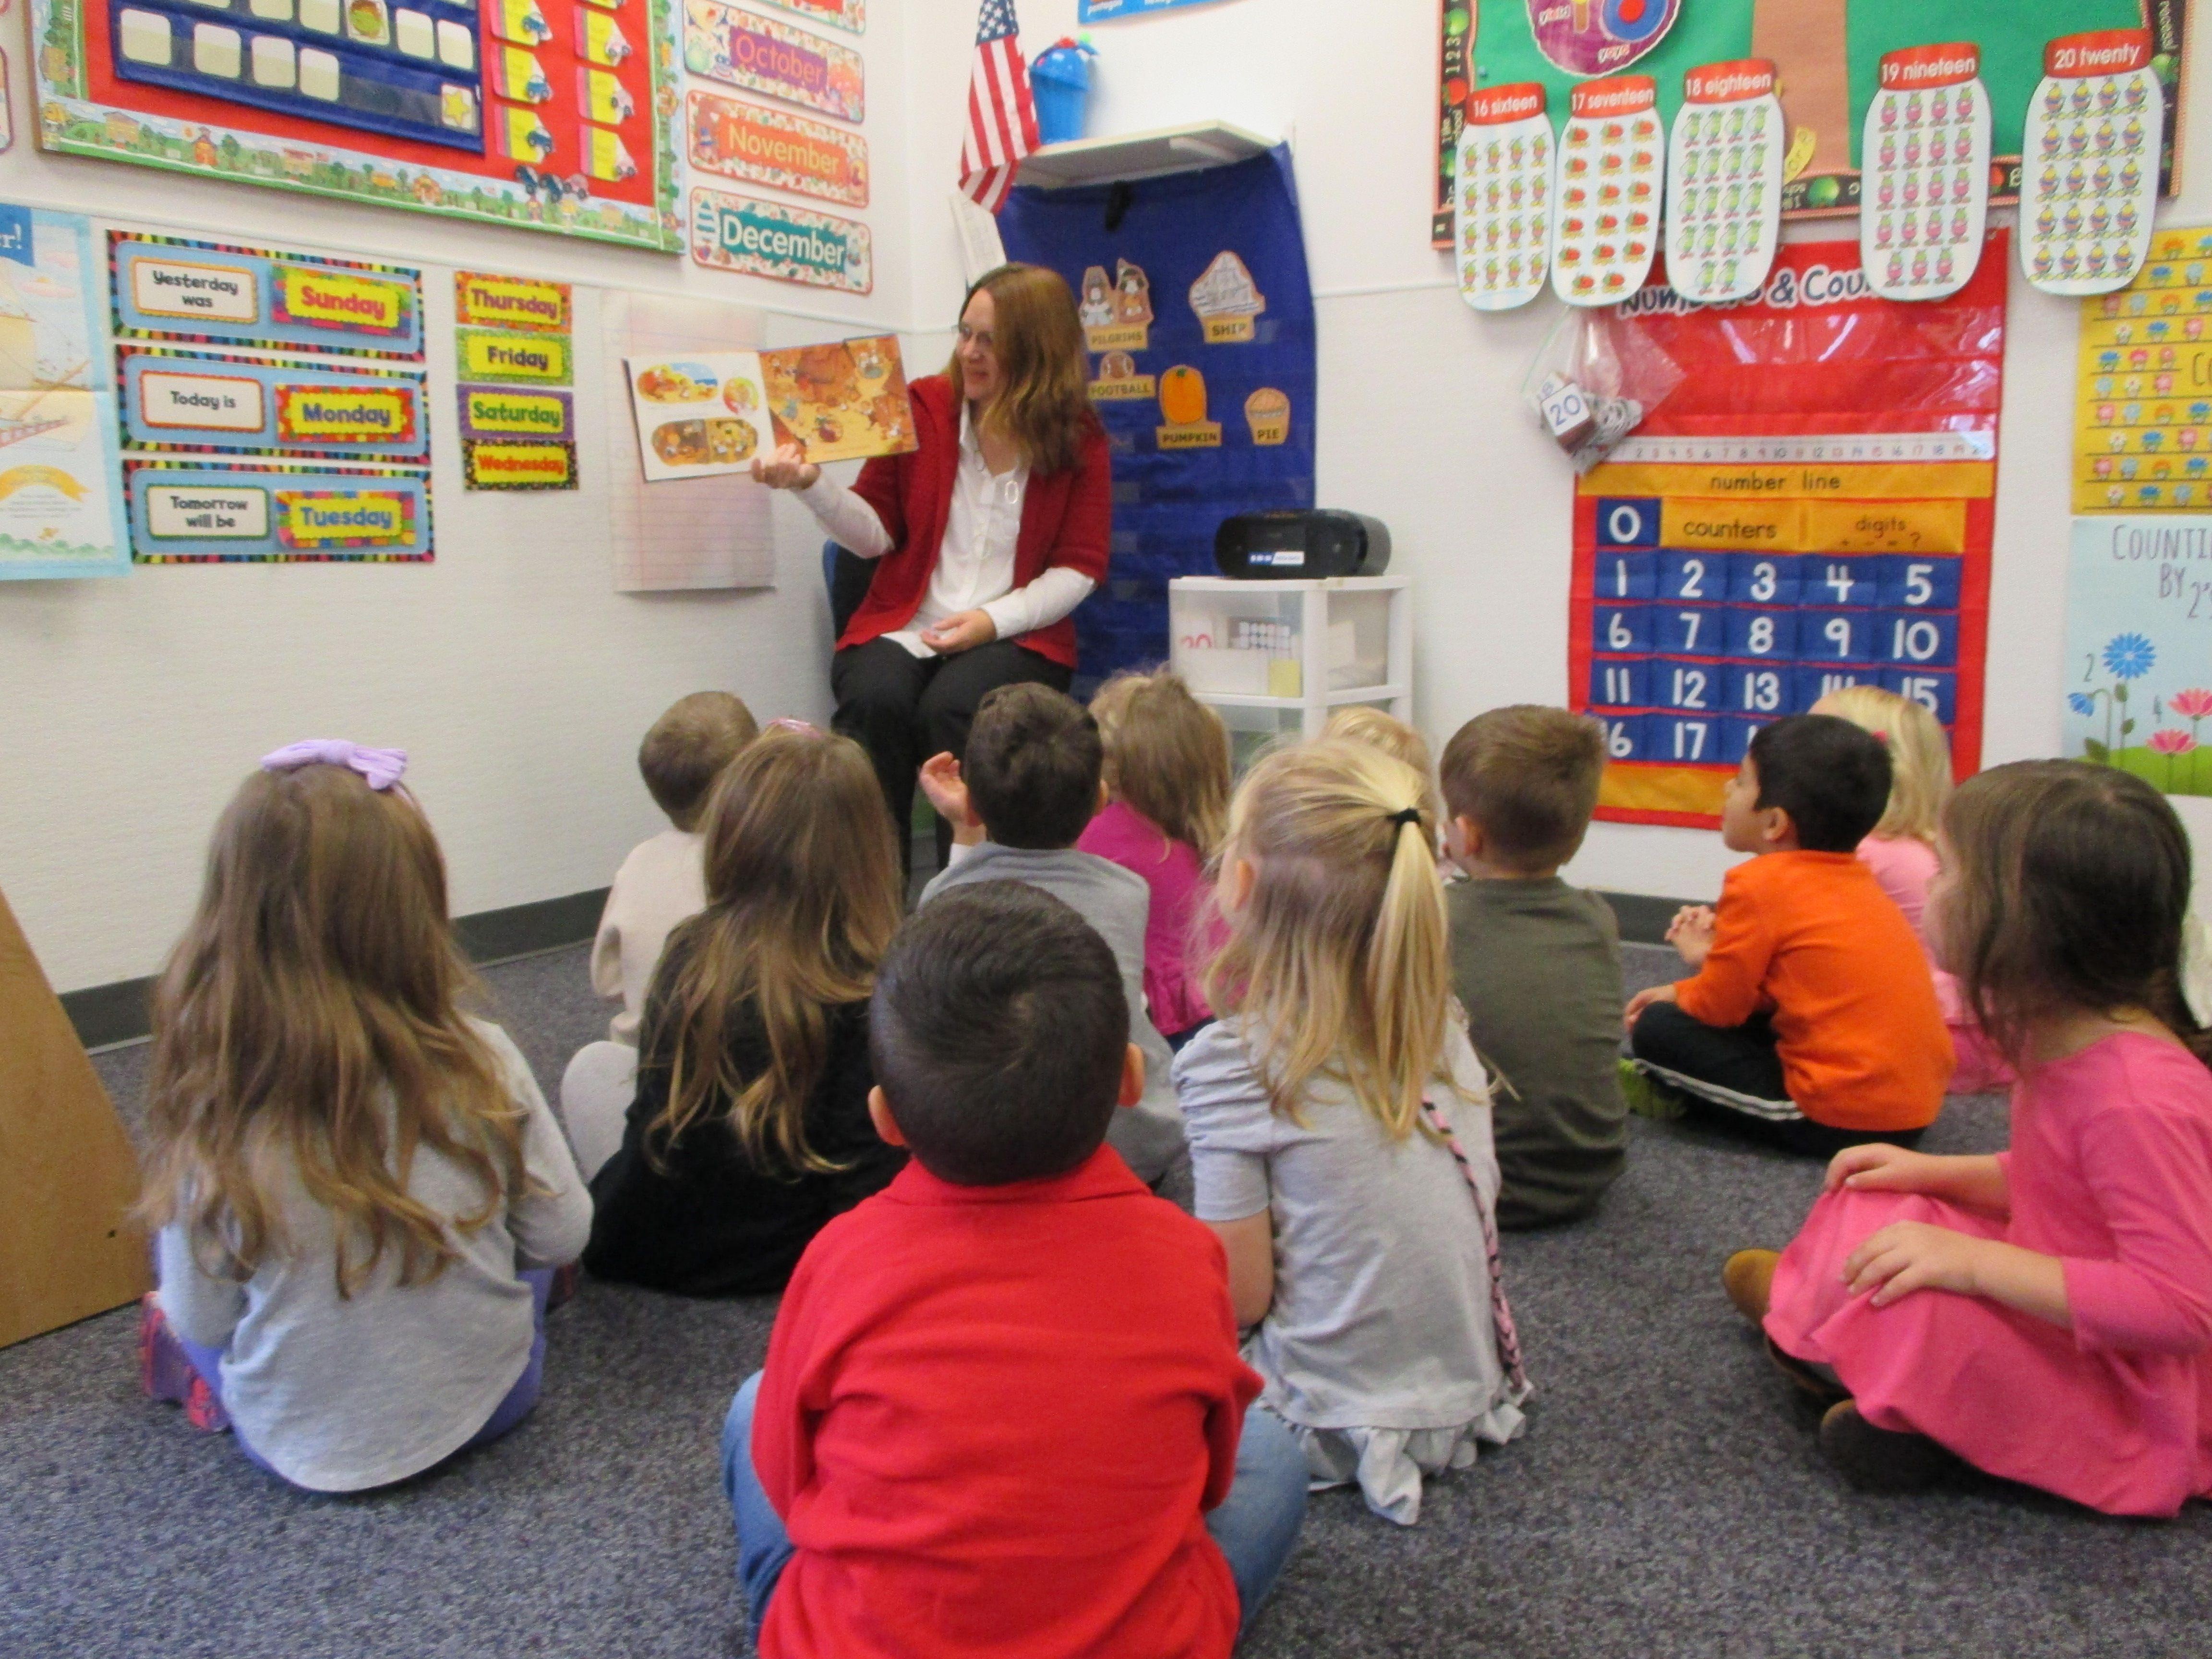 The Benefits Of Preschool Education